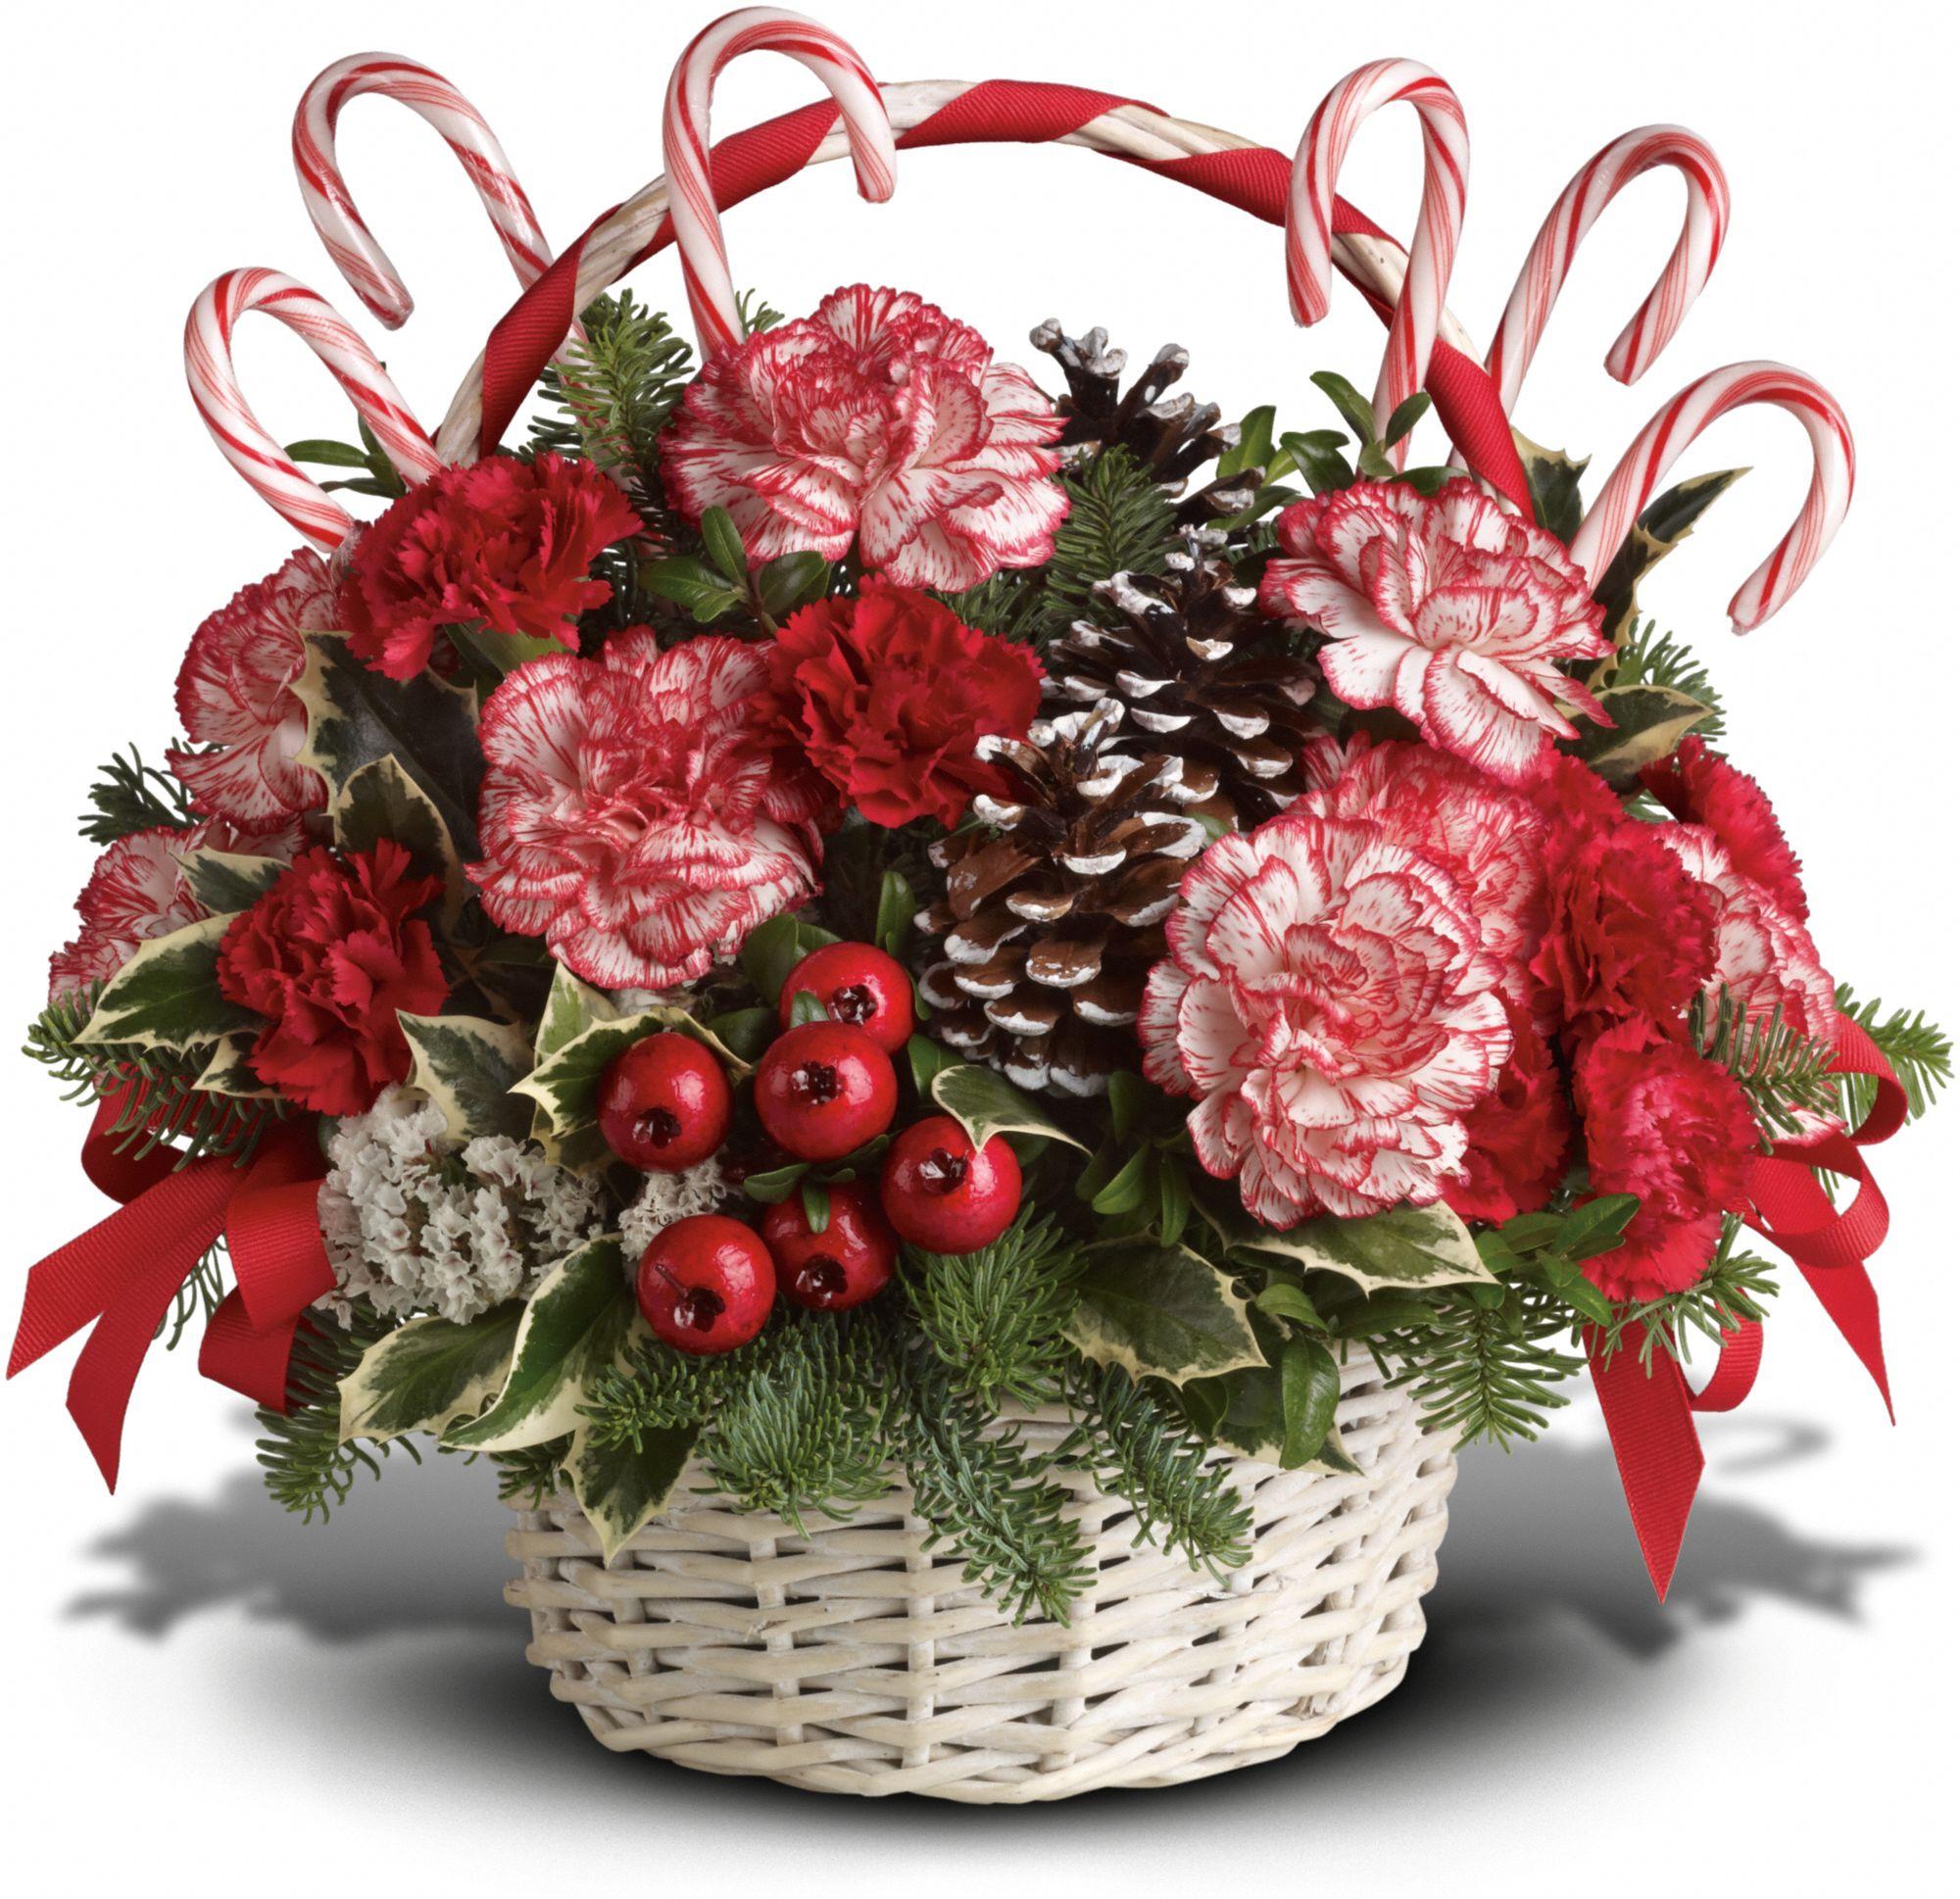 Candy Cane Christmas Gift Basket